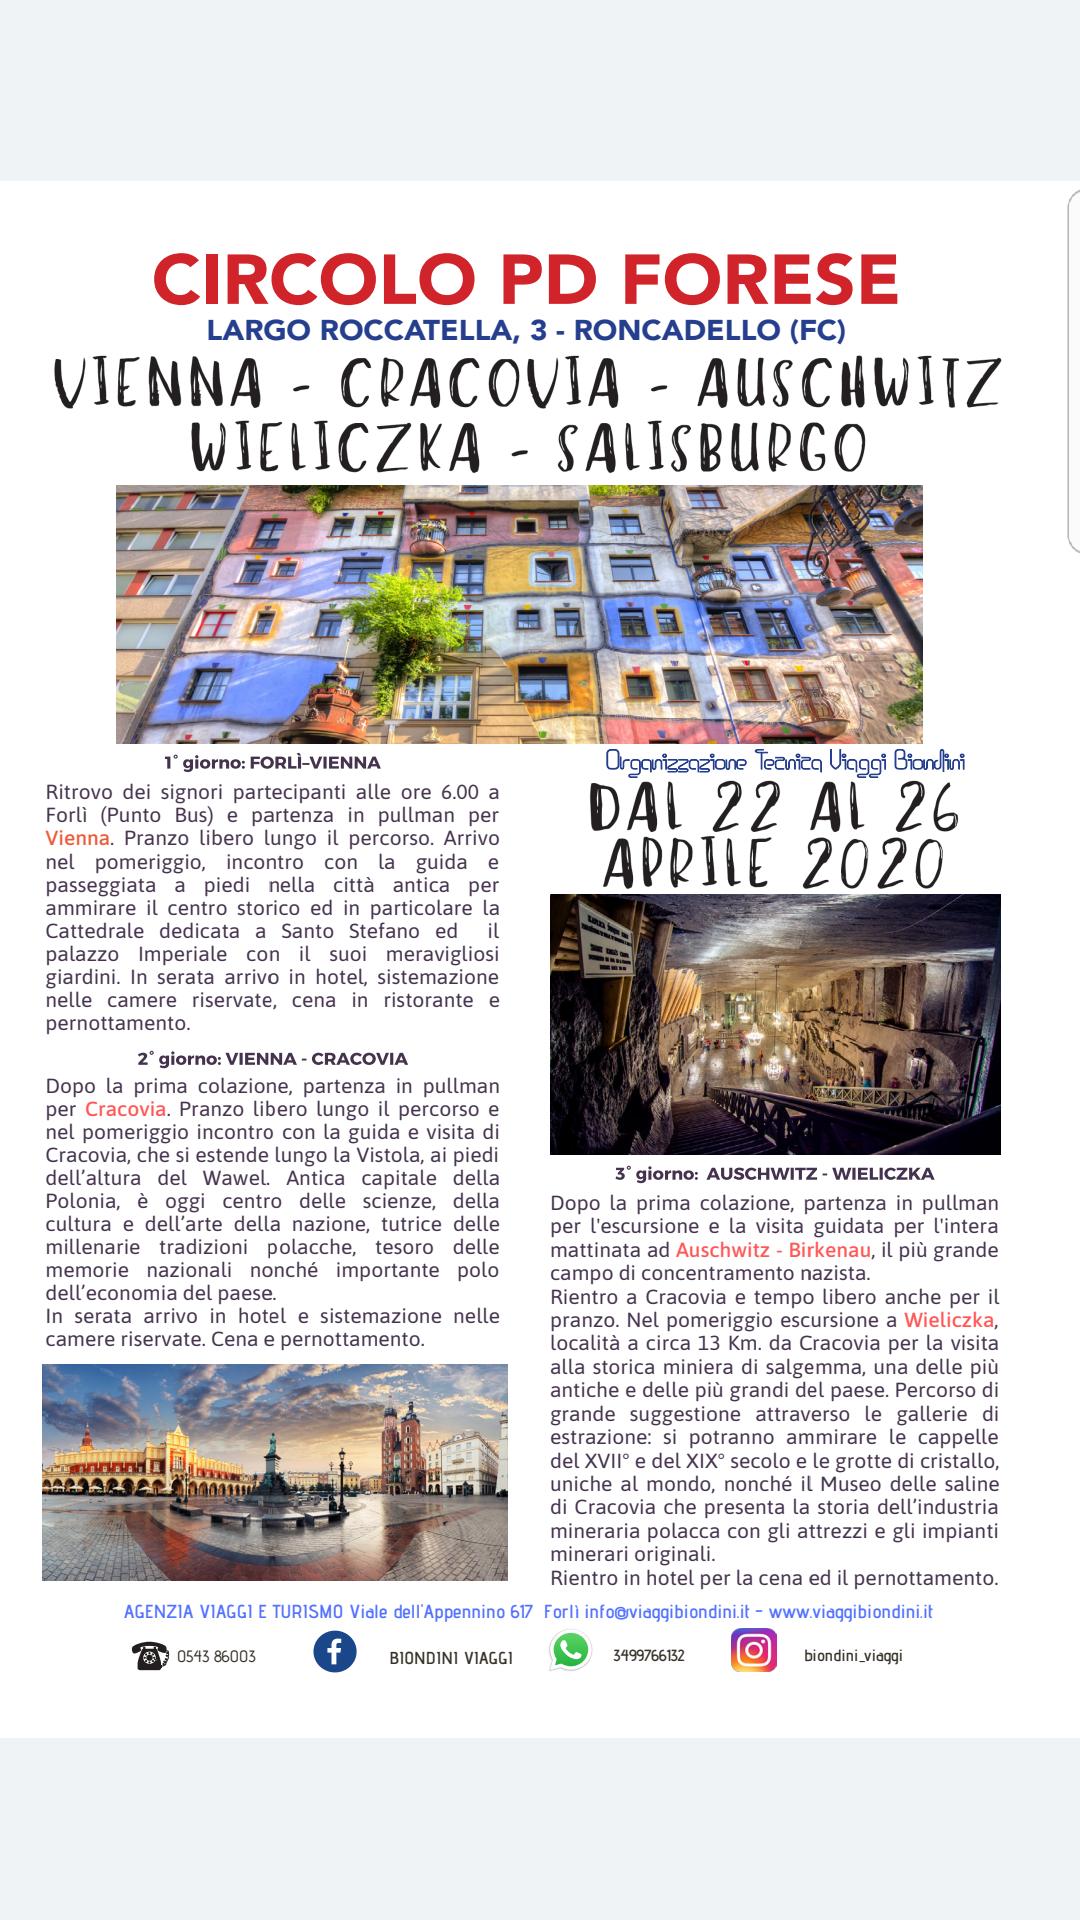 Viaggio in Austria @ Vienna-Cracovia-Aushwitz-Wieliczka-Salisburgo